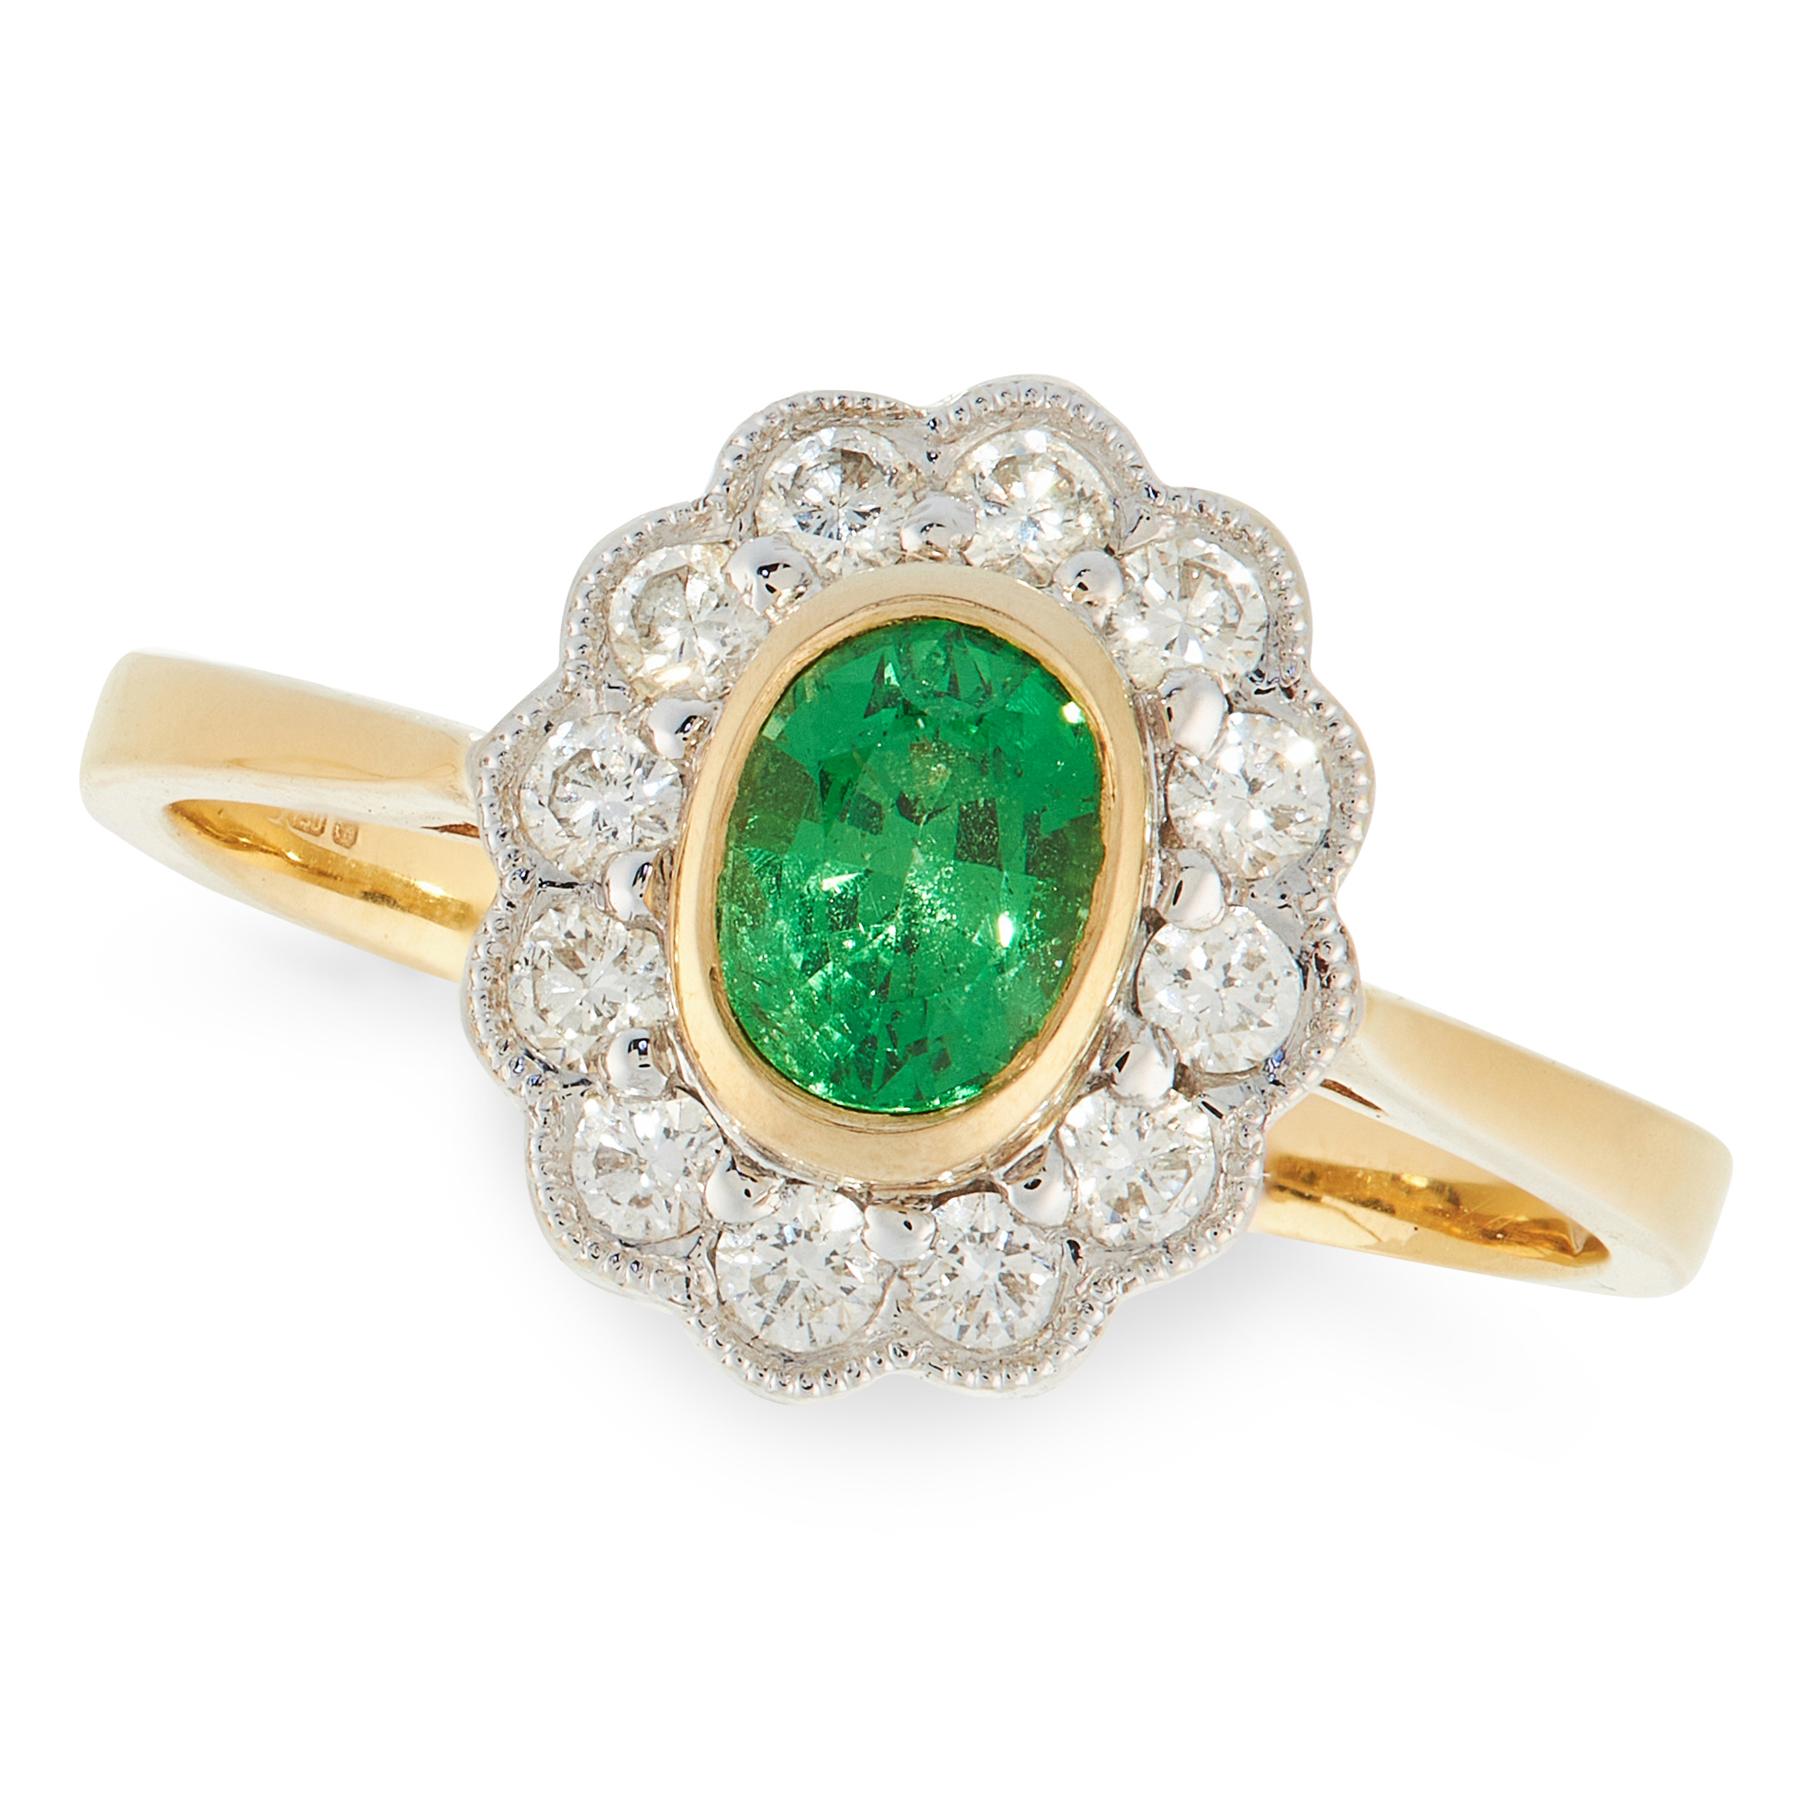 A GREEN GARNET AND DIAMOND DRESS RING in 18ct yellow gold, set with an oval cut green garnet